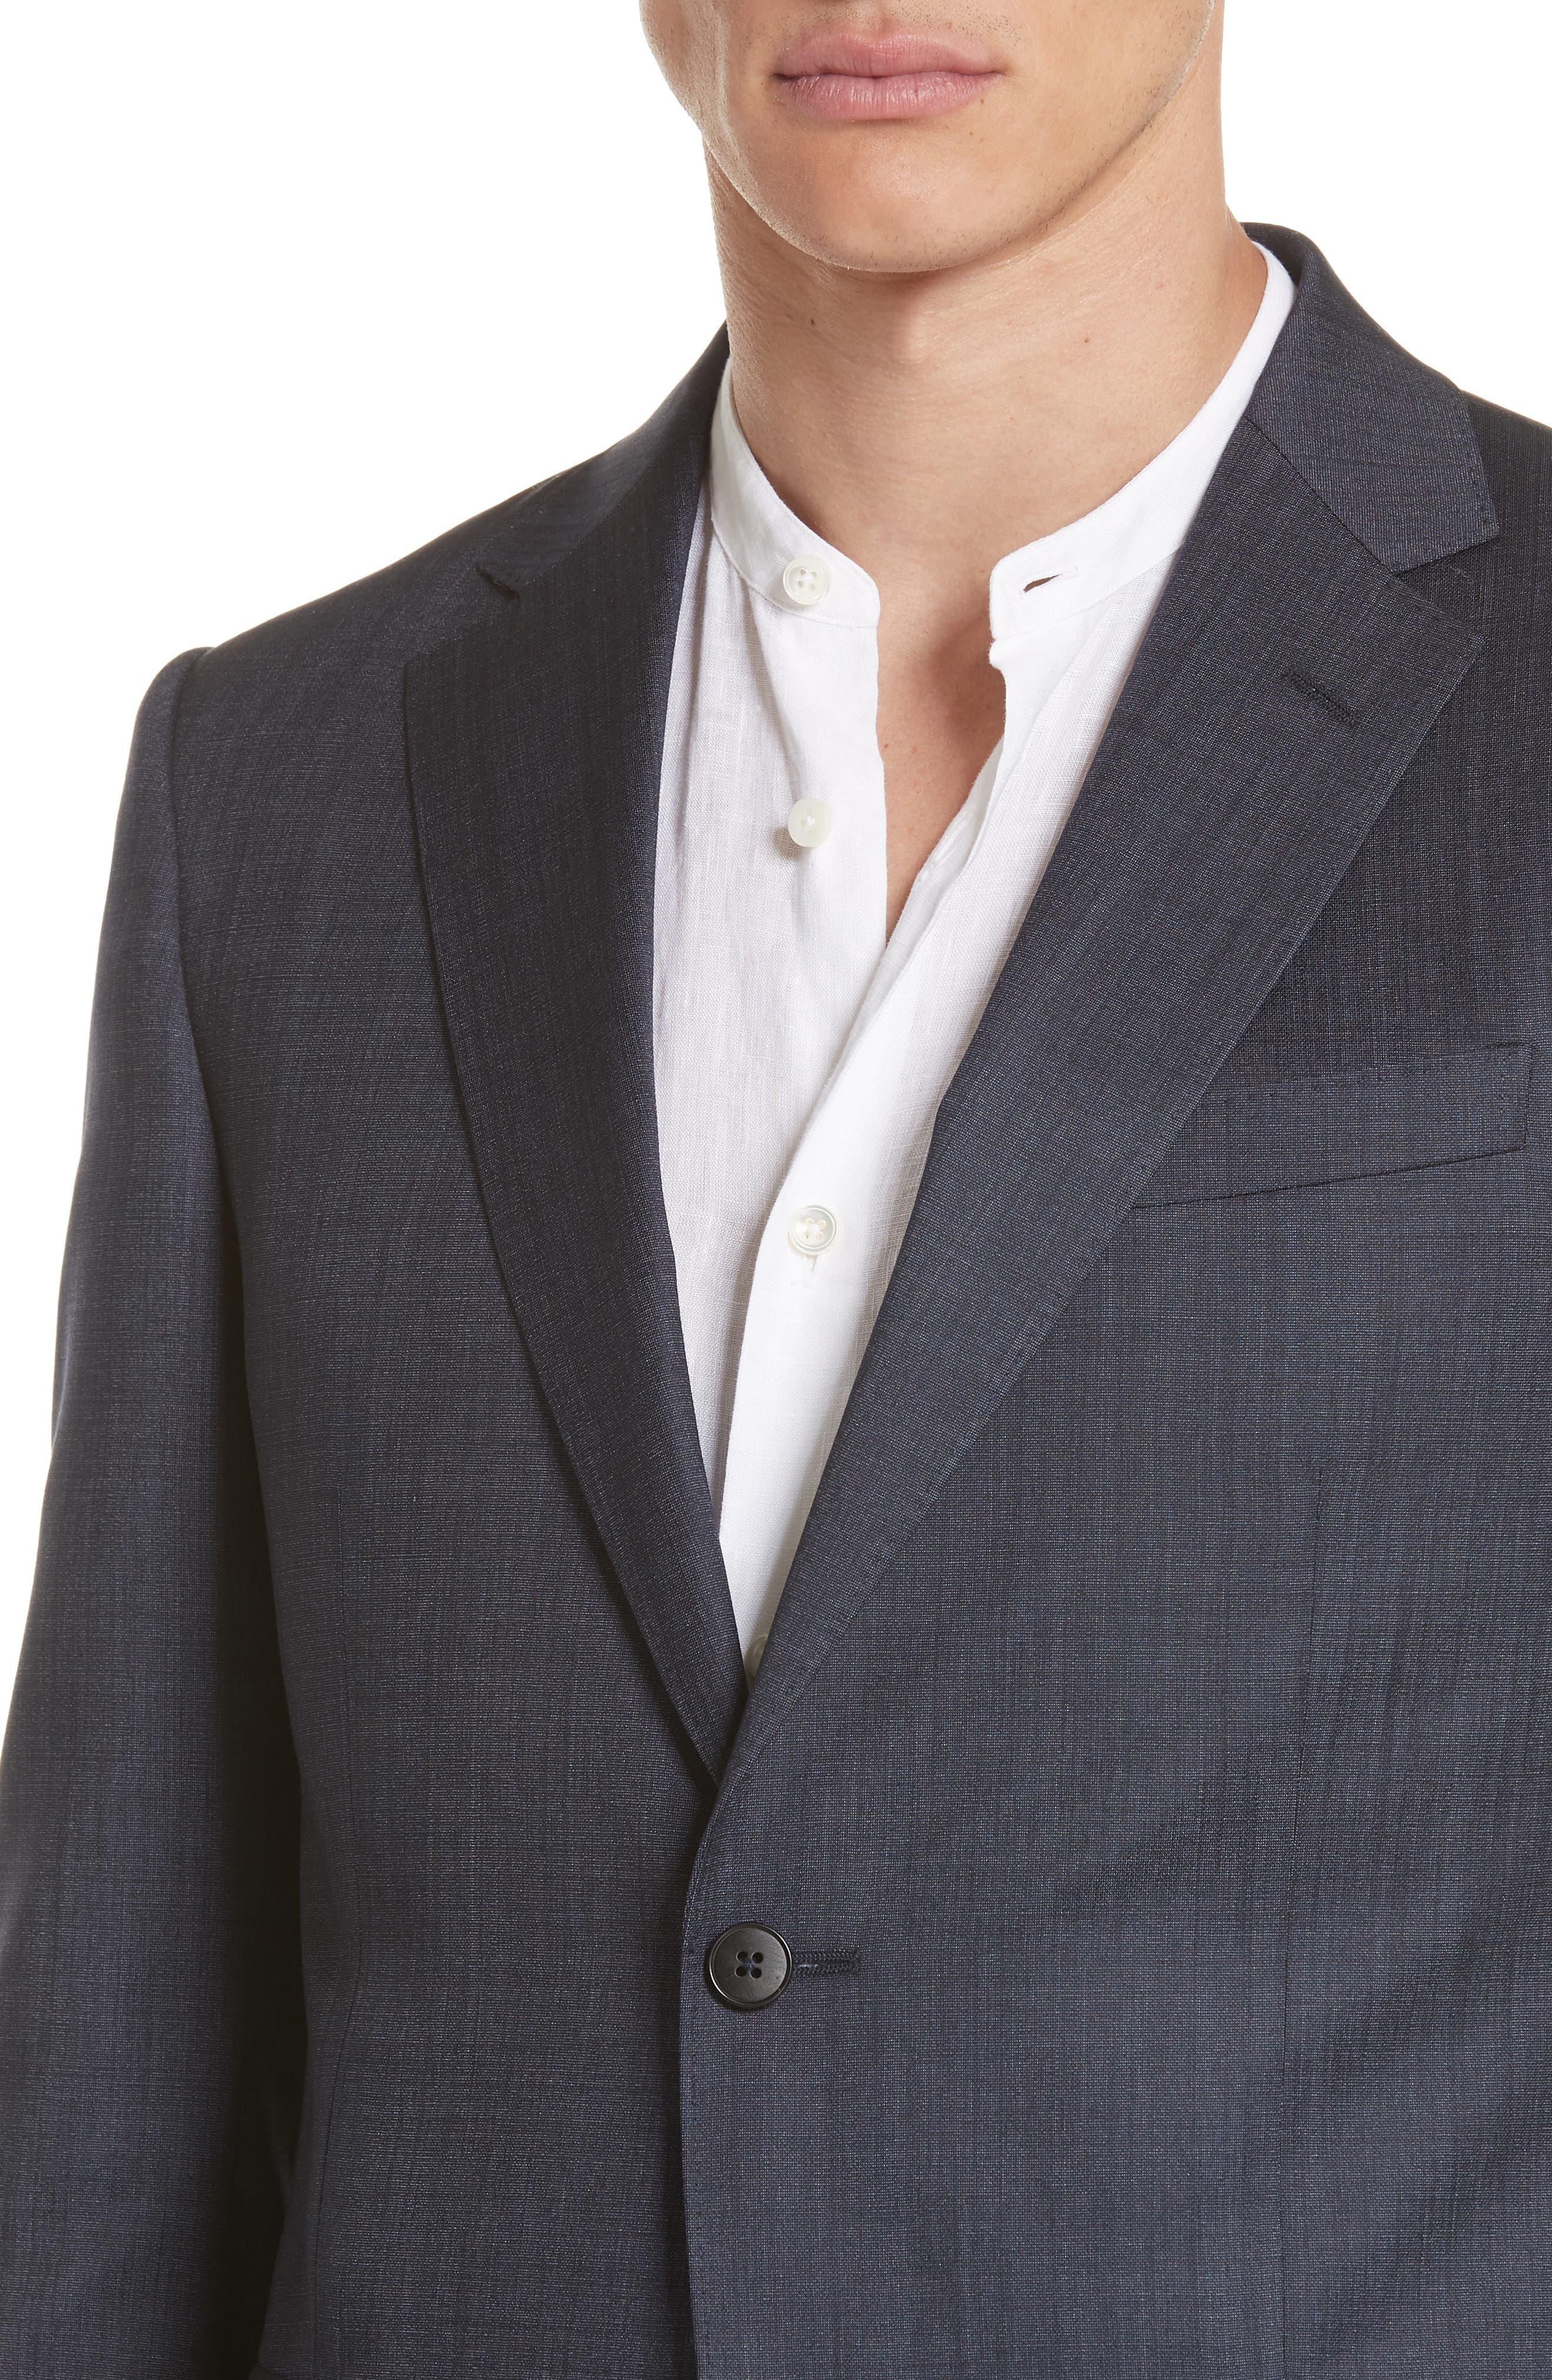 Trim Fit Solid Wool & Silk Suit,                             Alternate thumbnail 4, color,                             Navy